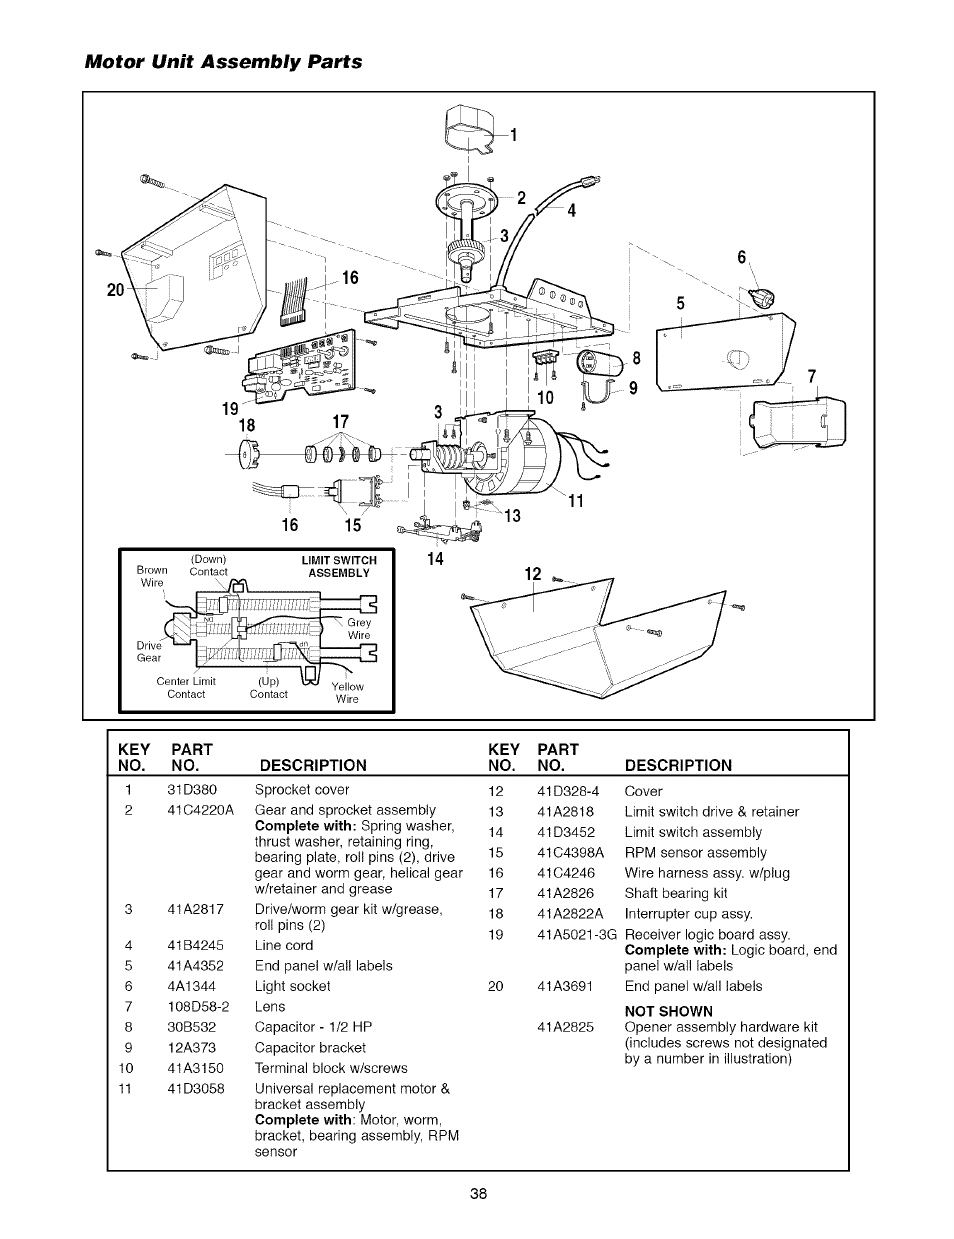 Craftsman Garage Door Opener Motor Unit Assembly Parts Manual Guide